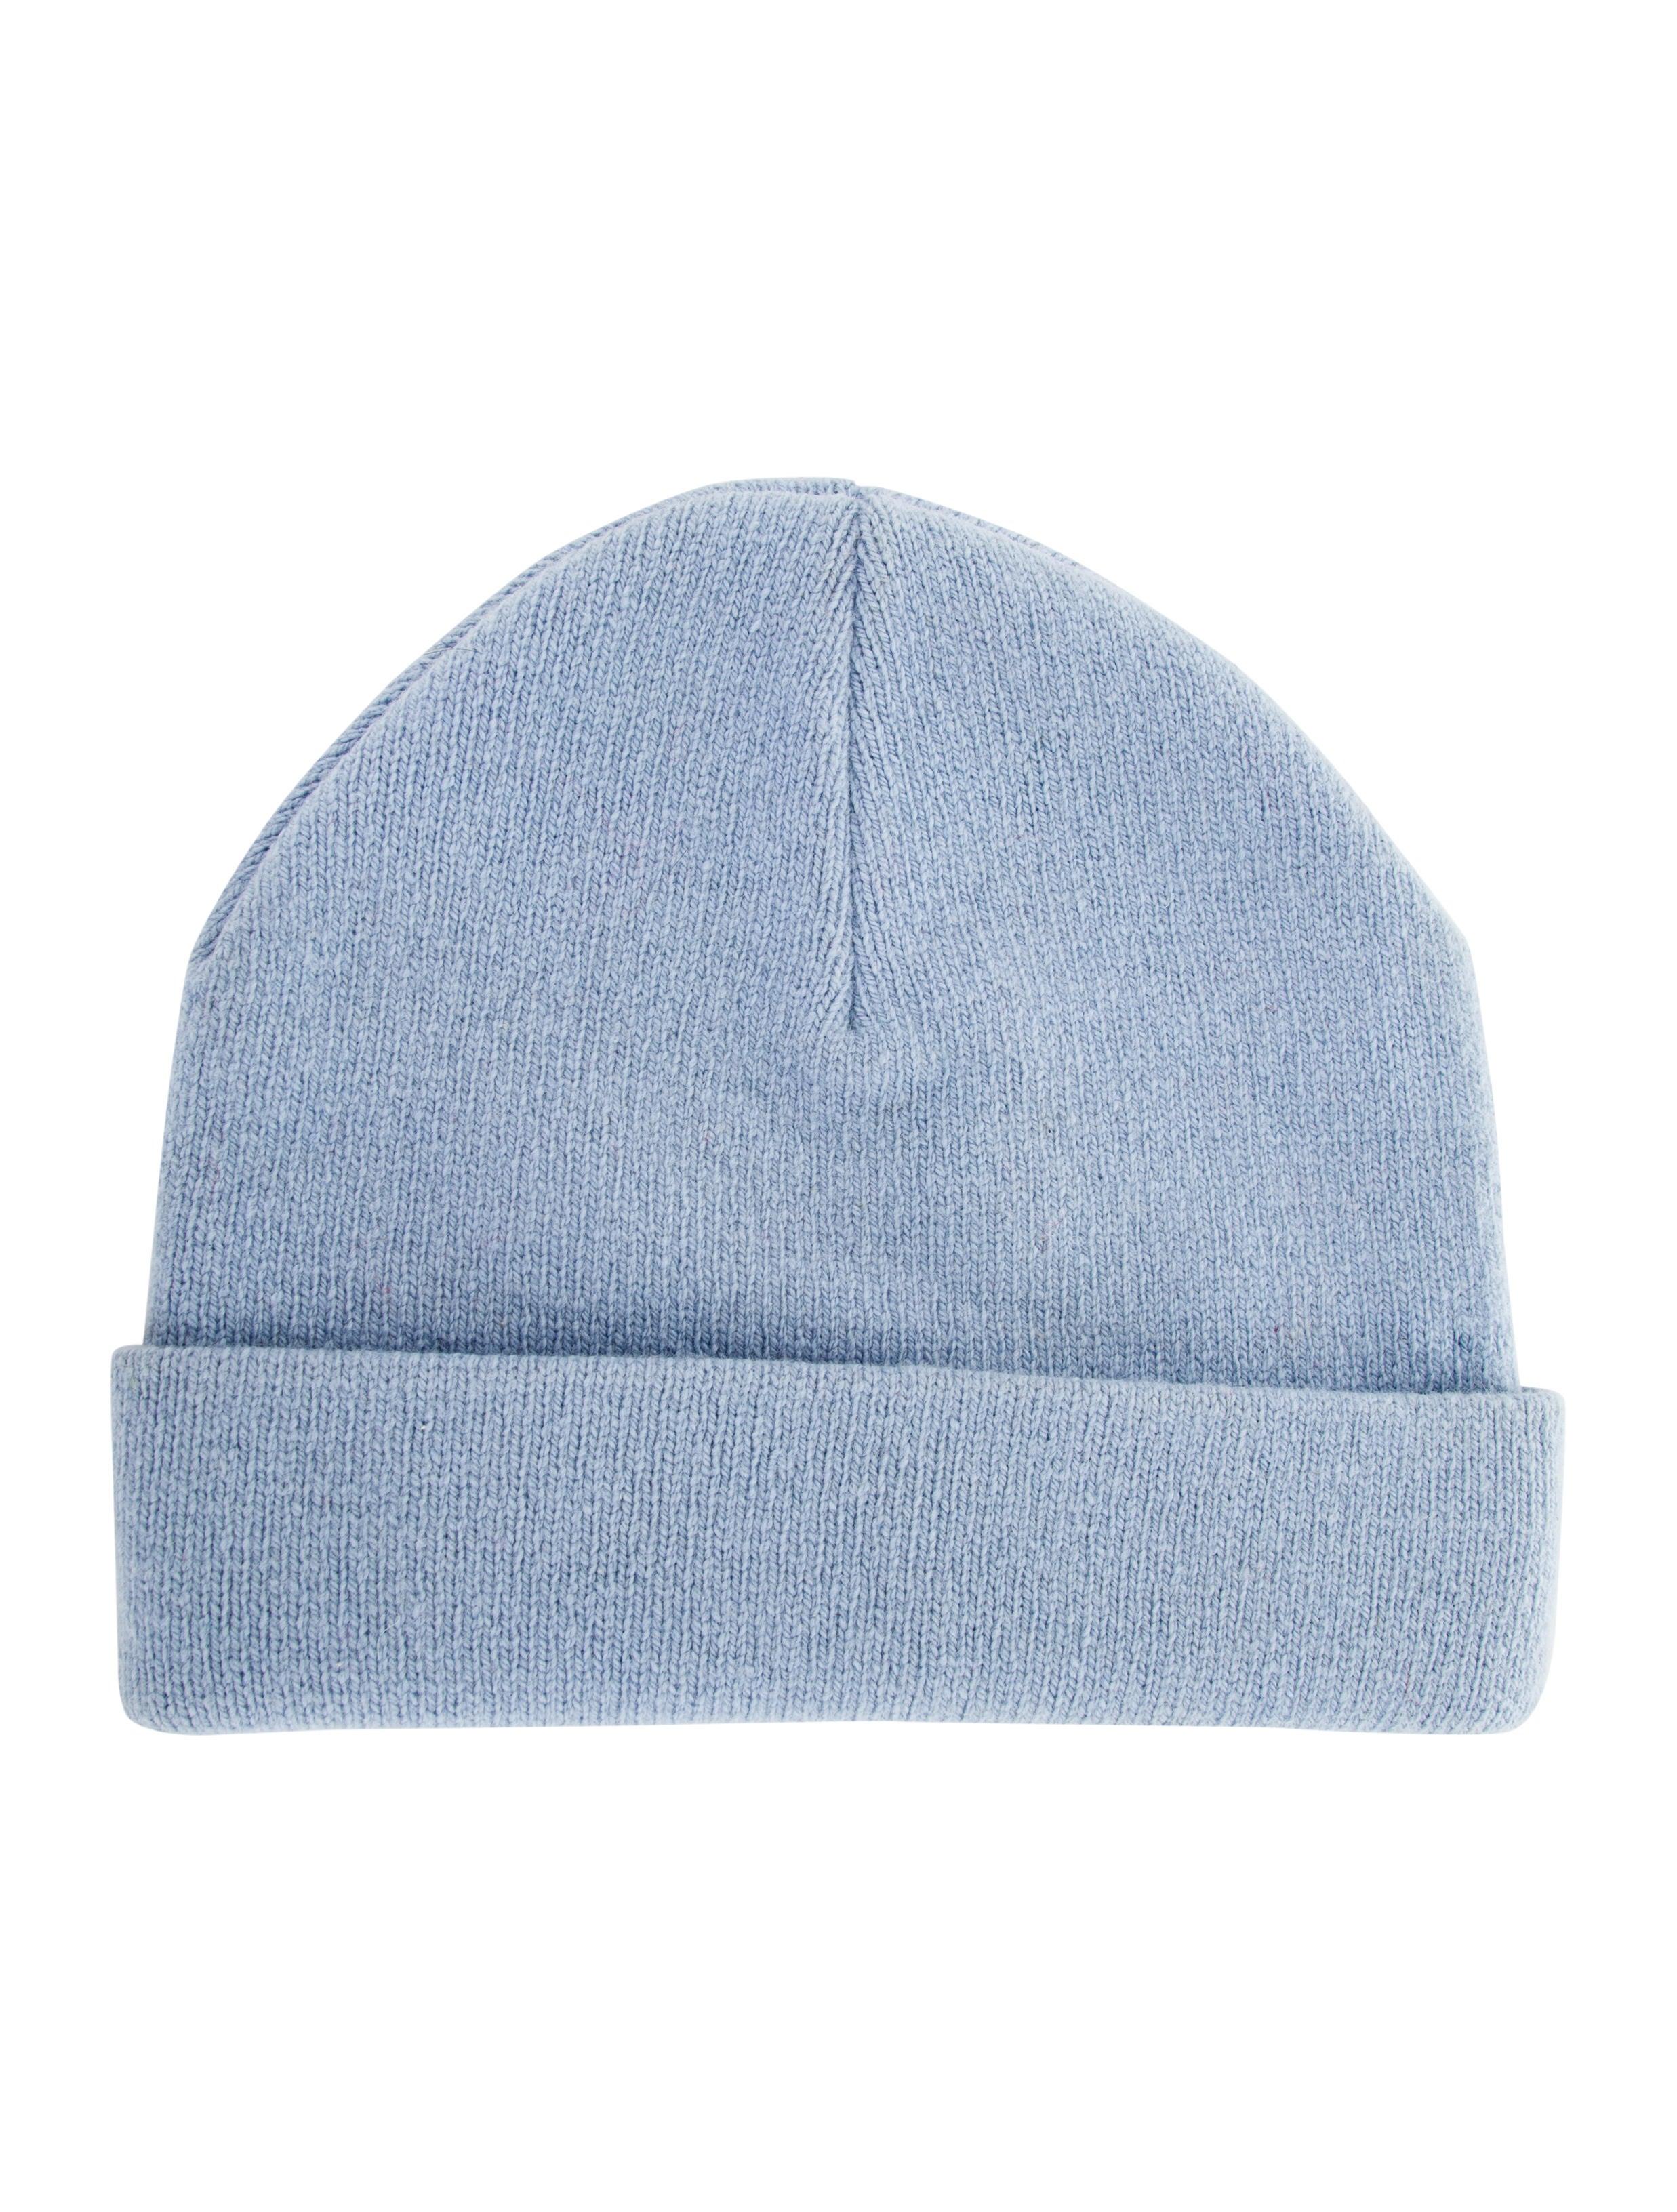 Burberry Merino Wool-Blend Knit Beanie - Accessories - BUR118691 ... f06c28c1c0c